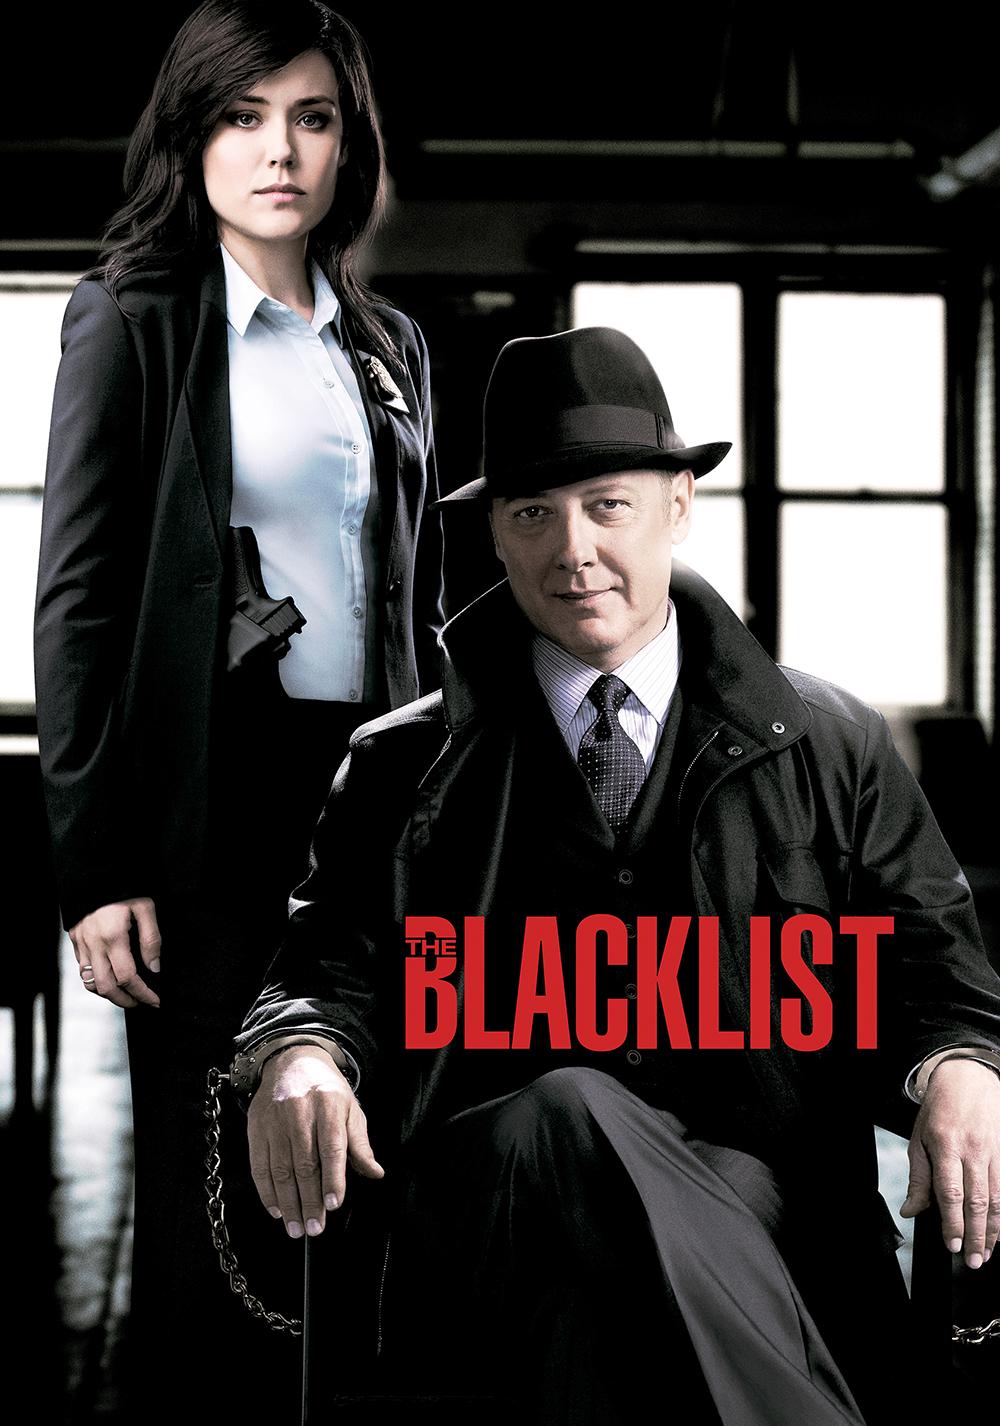 the-blacklist-524a1233097ec.jpg